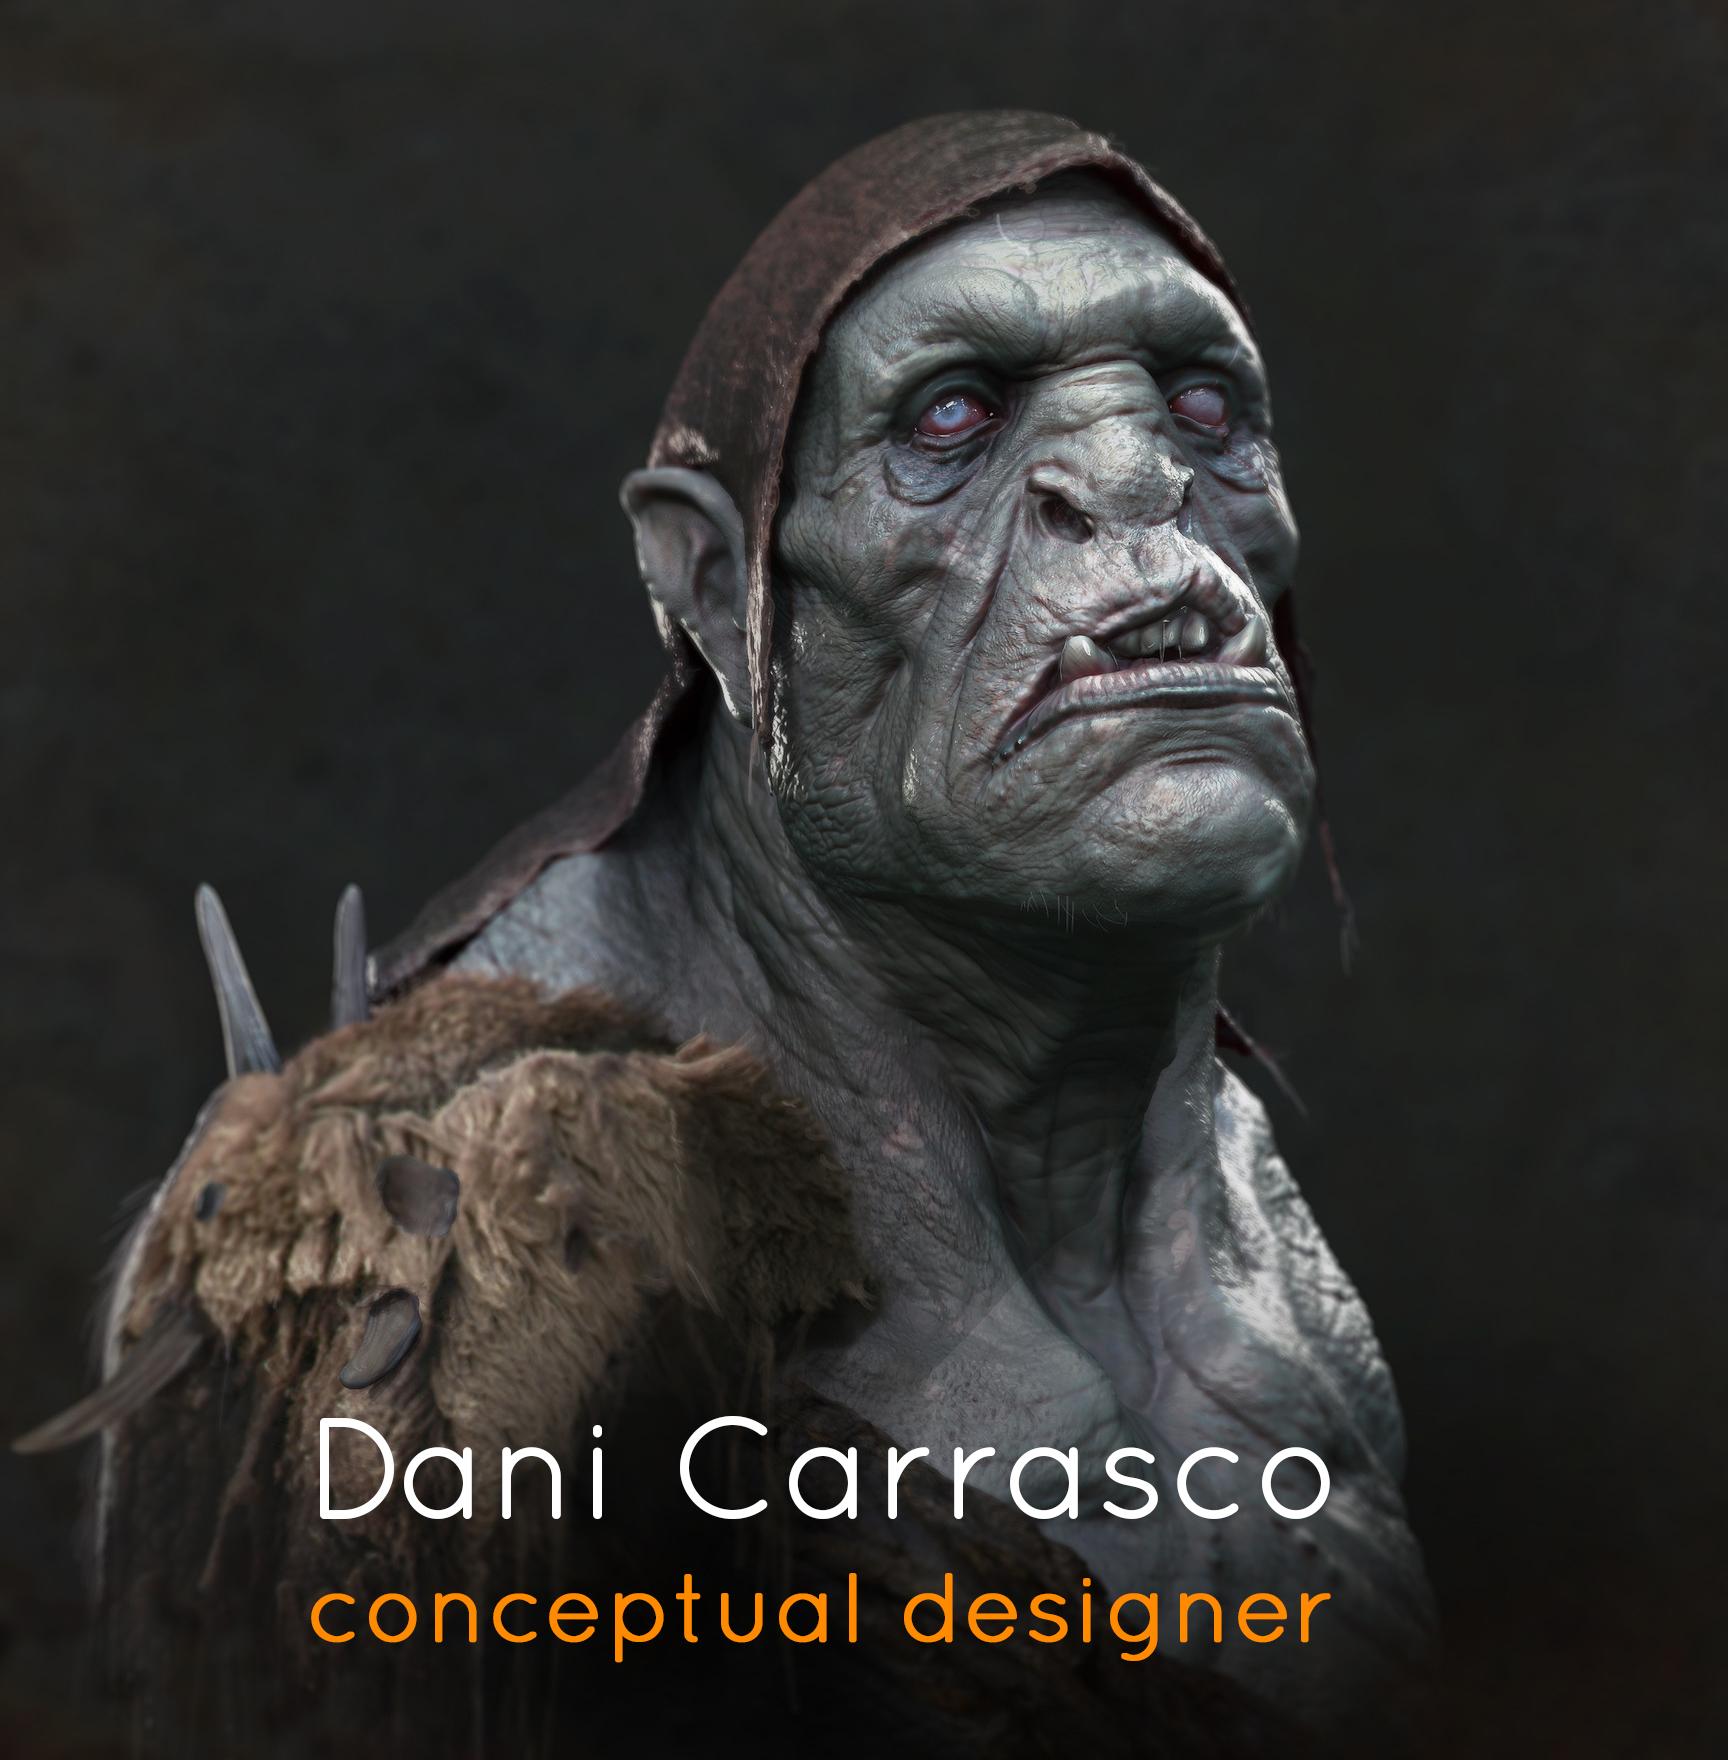 Dani Carrasco